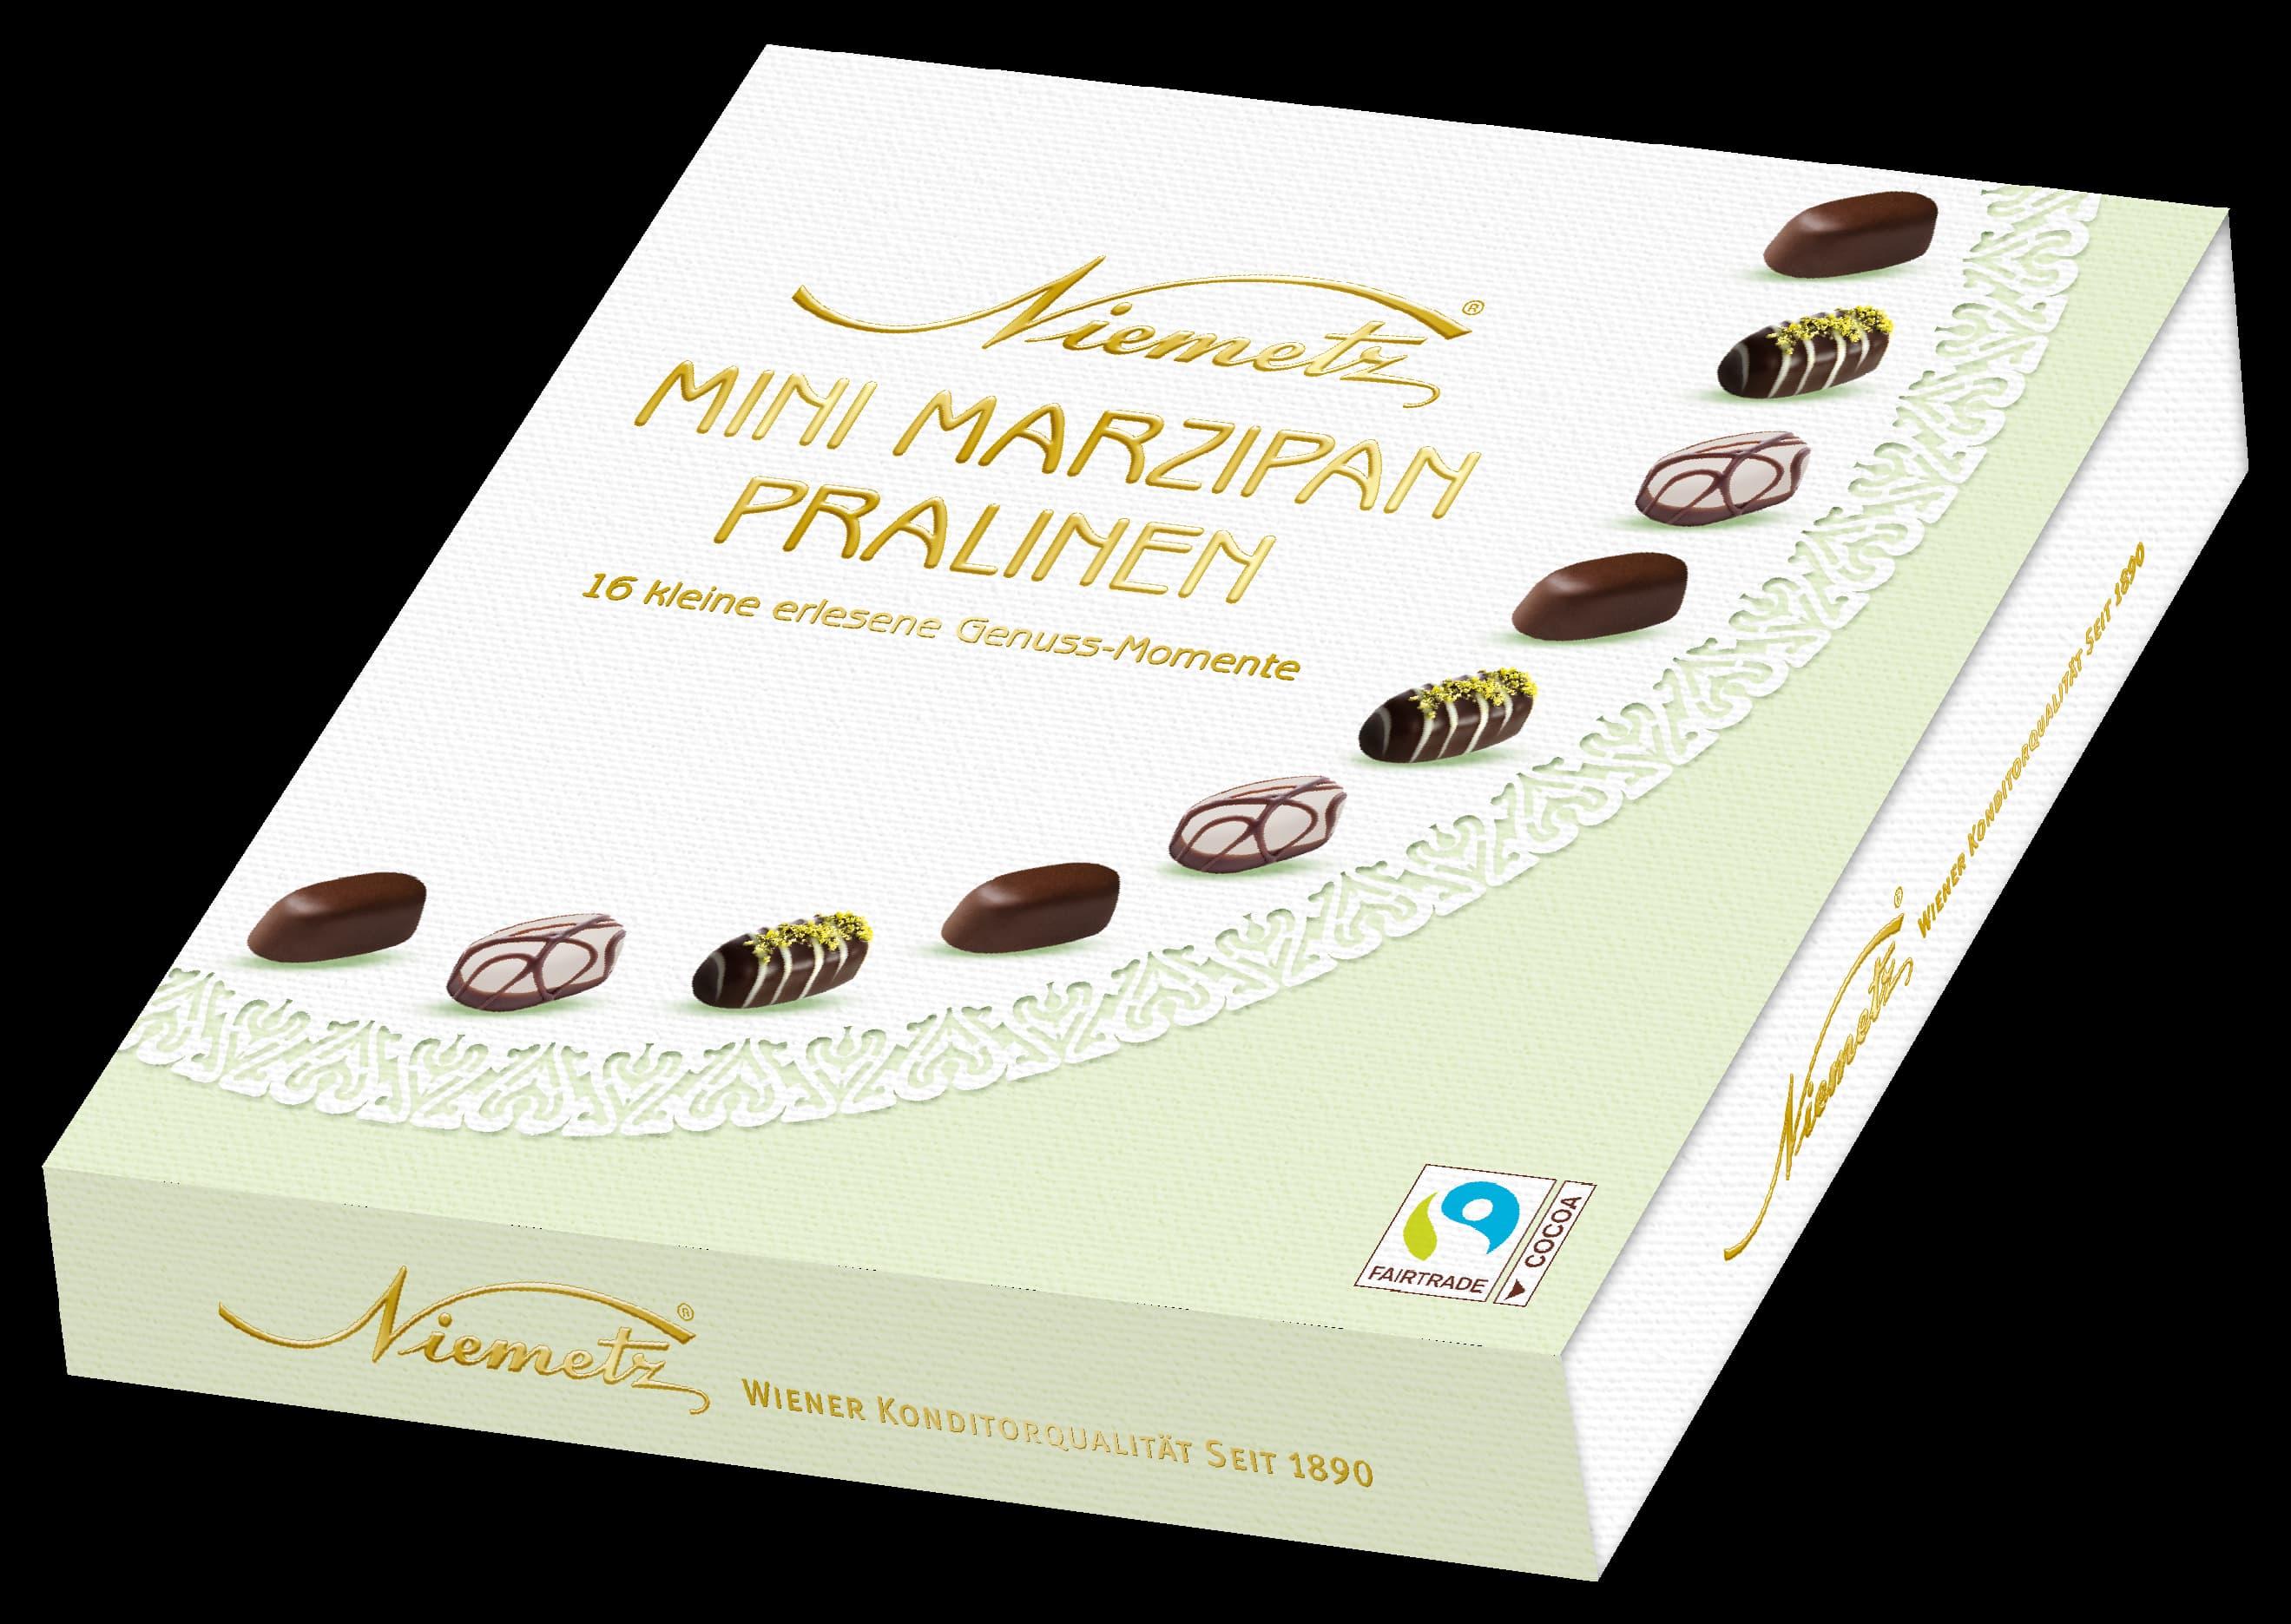 Mini Marzipan Pralinen